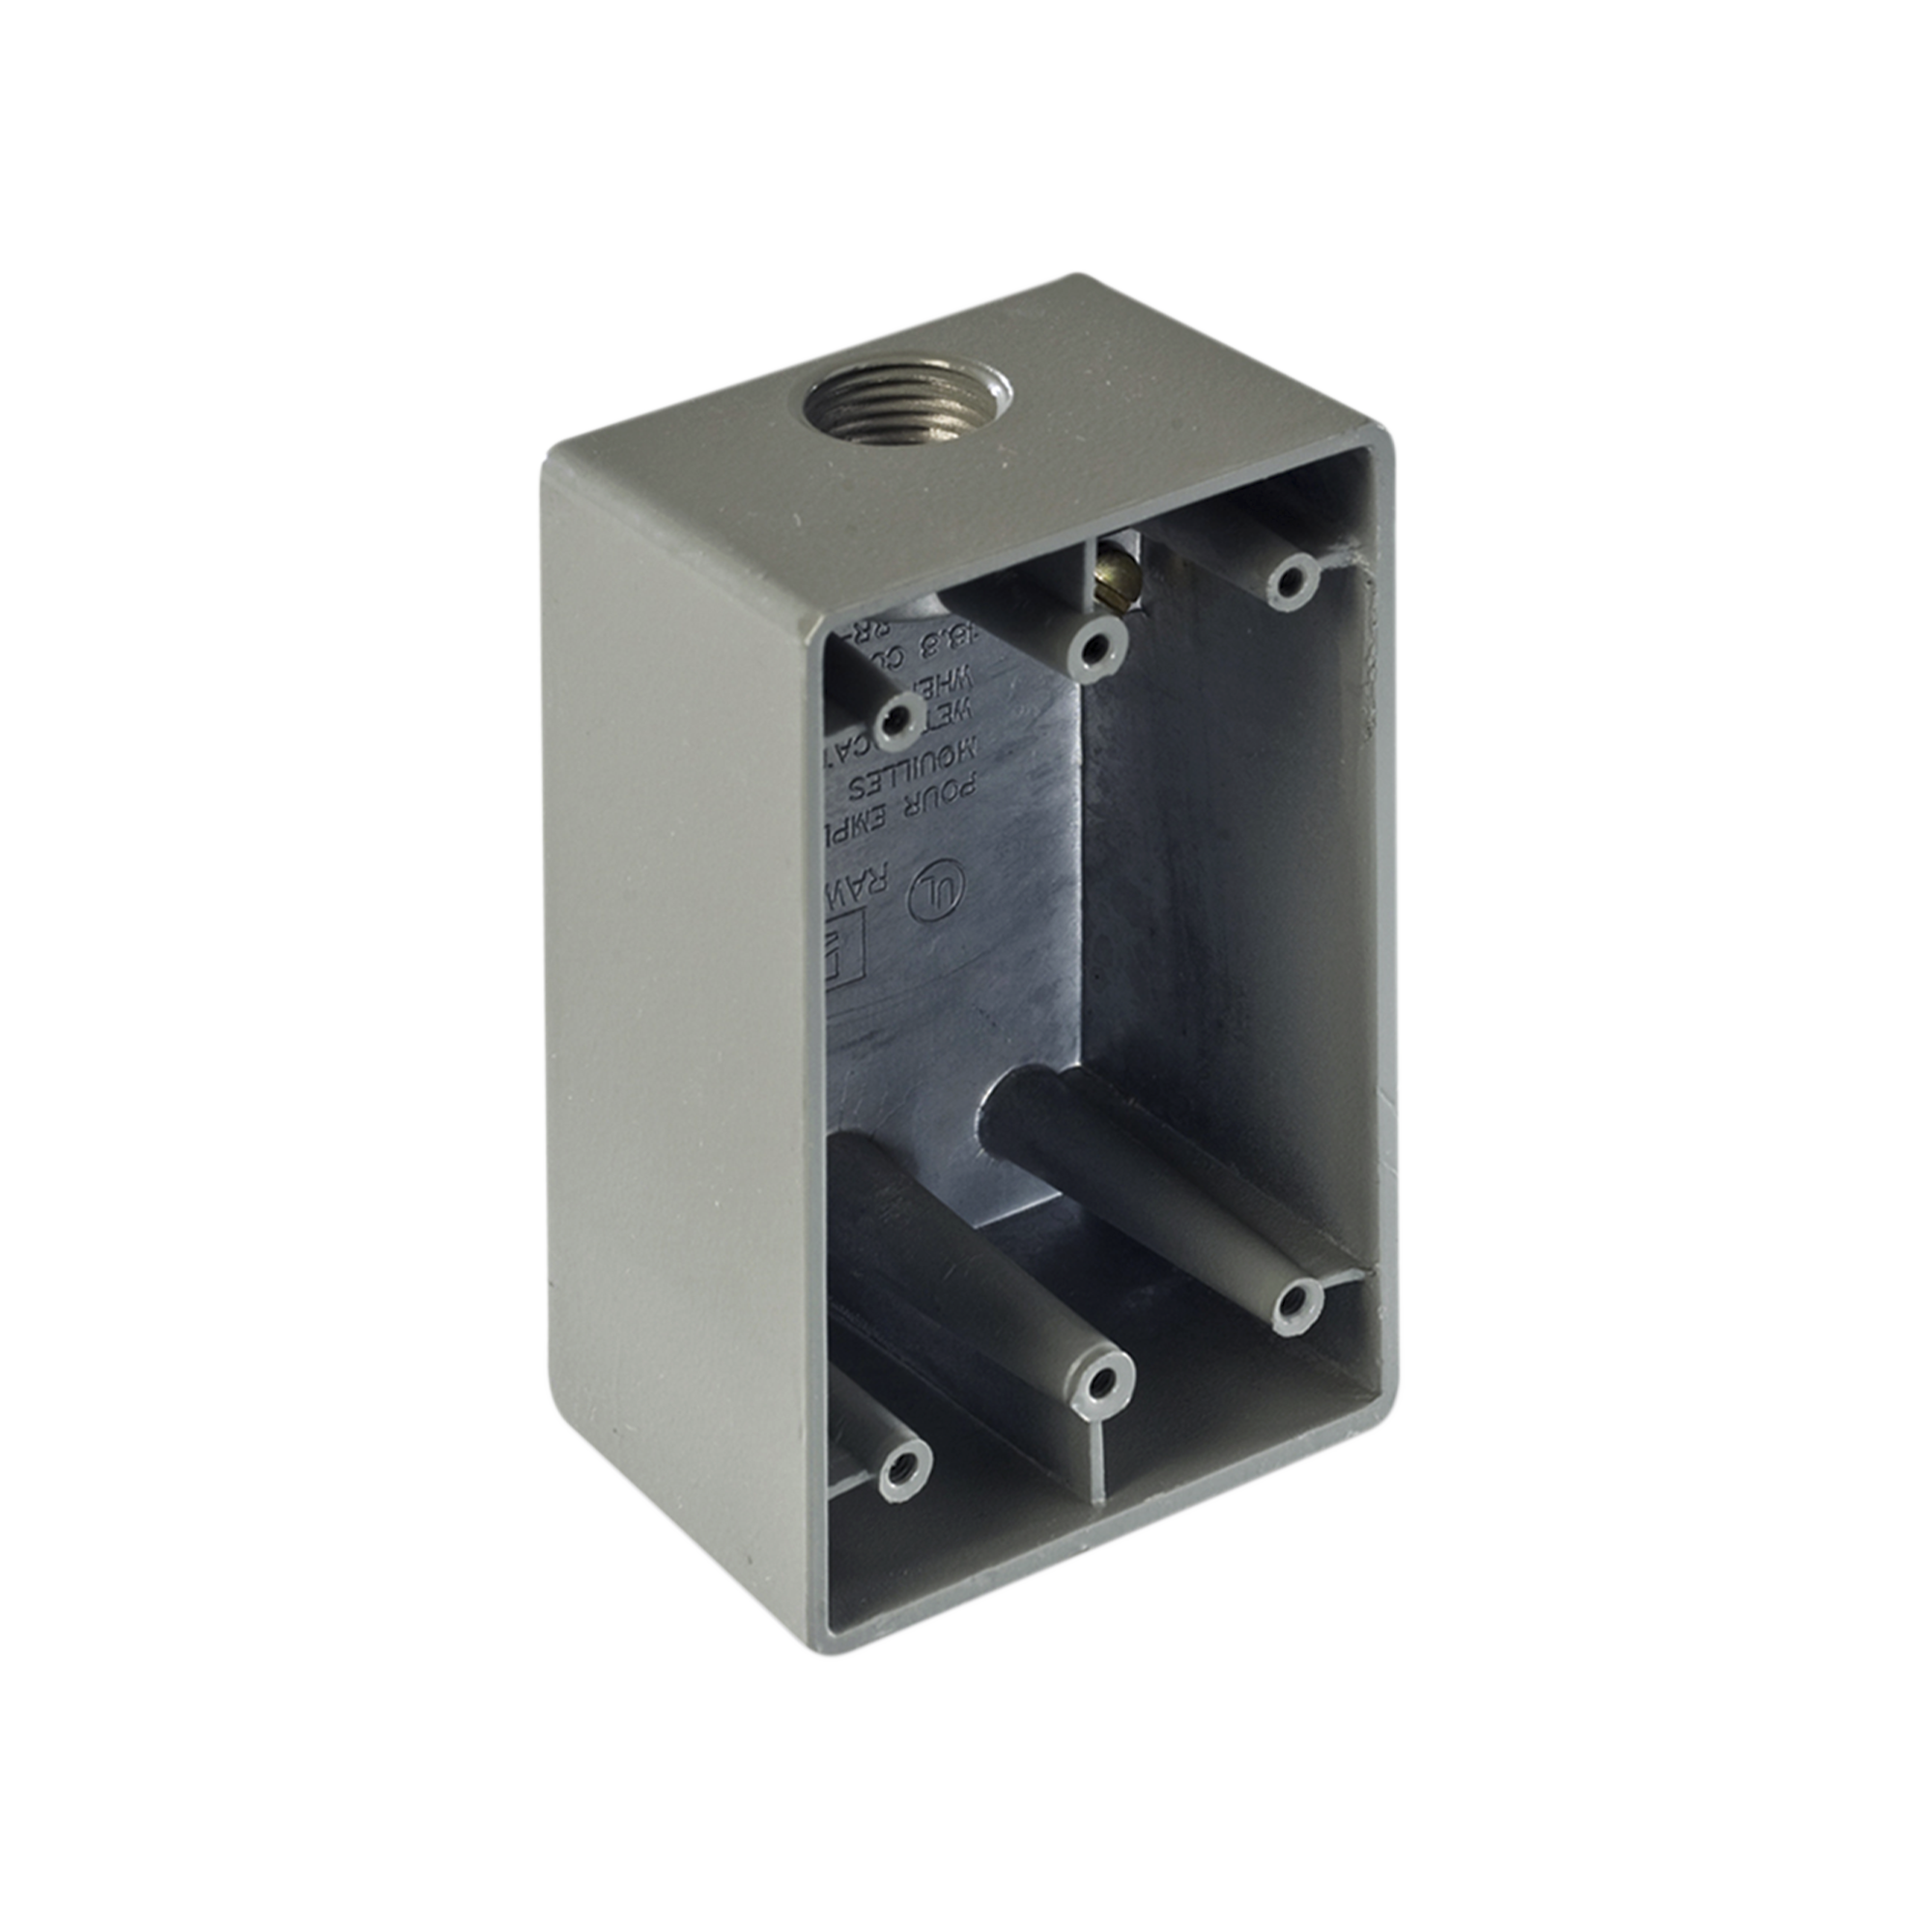 Caja Condulet FS de 1/2 ( 12.7 mm) con una boca a prueba de intemperie.